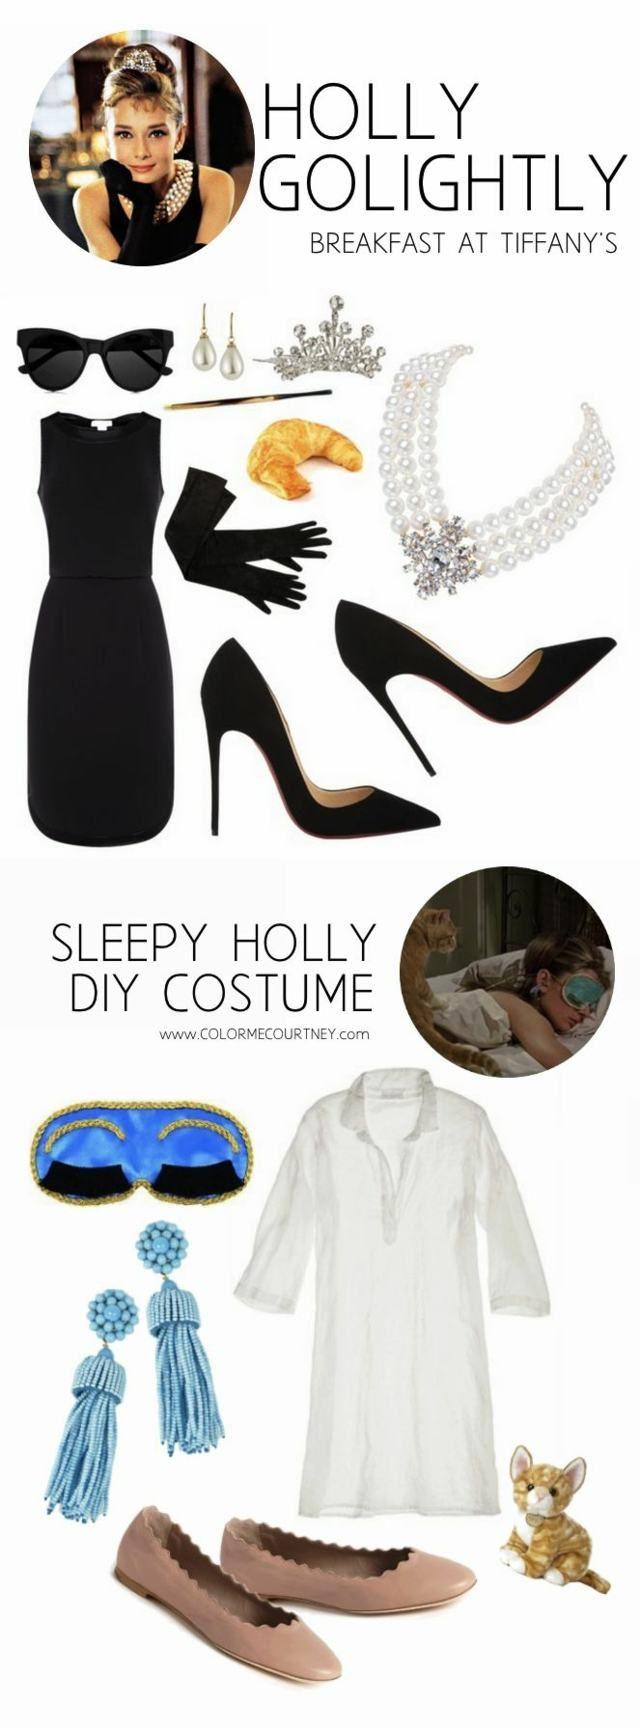 d guisement halloween femme la derni re minute film culte id es originales et originaux. Black Bedroom Furniture Sets. Home Design Ideas